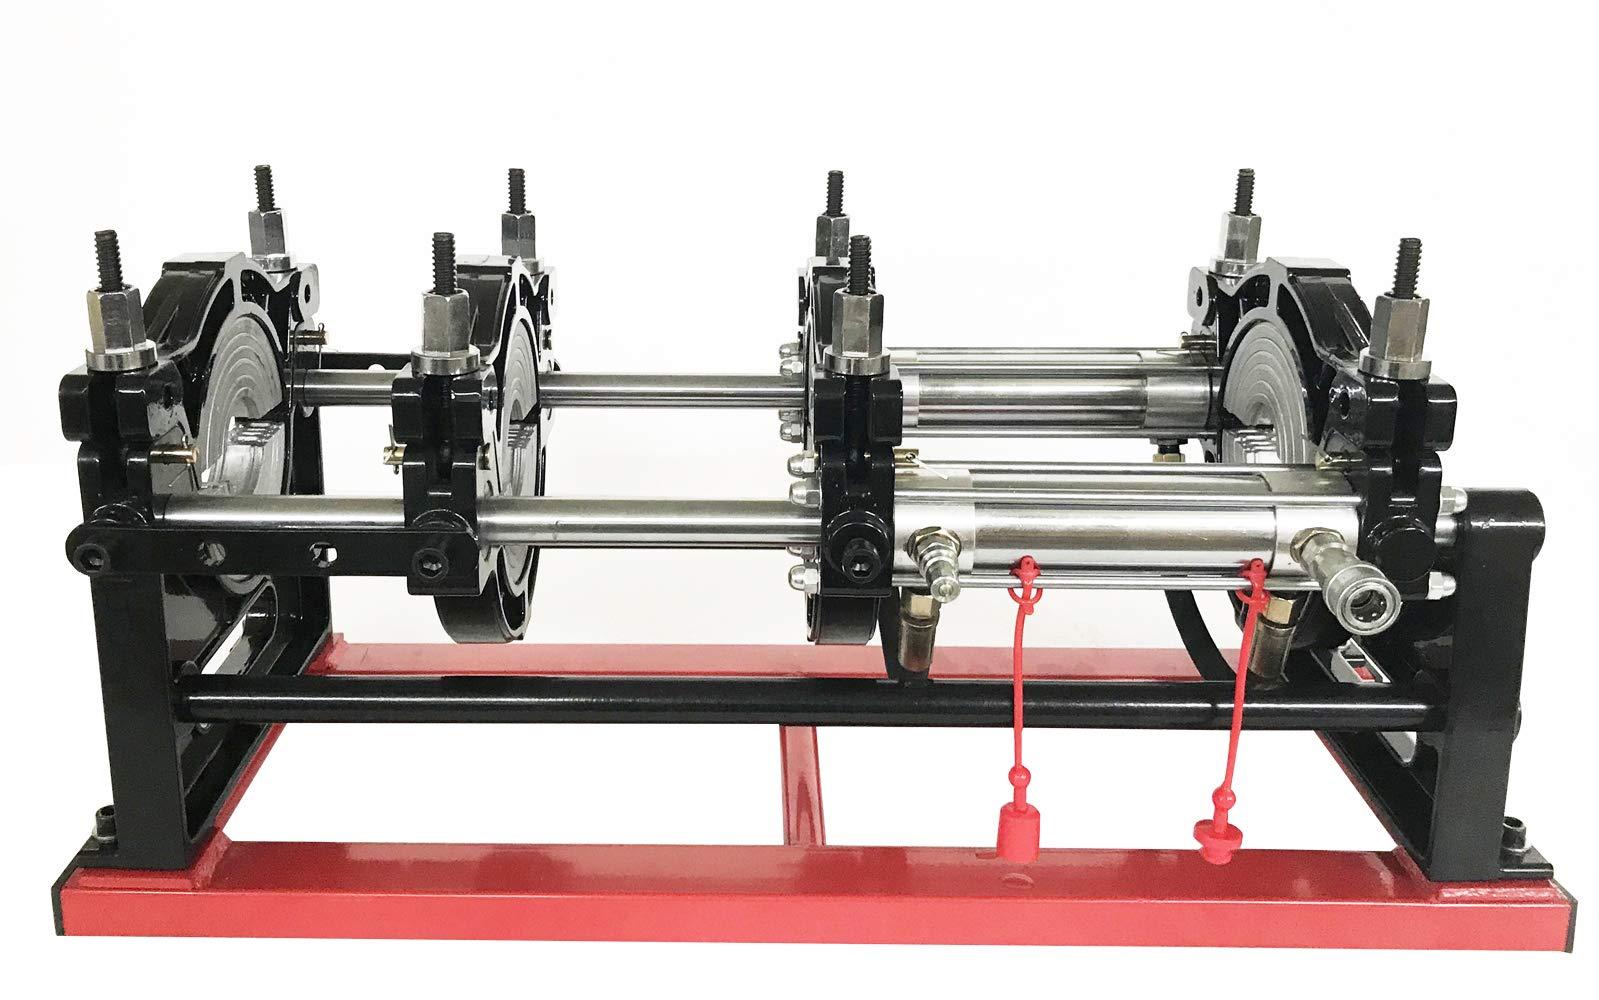 TECHTONGDA Hydraulic Pipe Welding Machine Electric Tube Butt Fusion Equipment for PE PP PB PVDF PPR